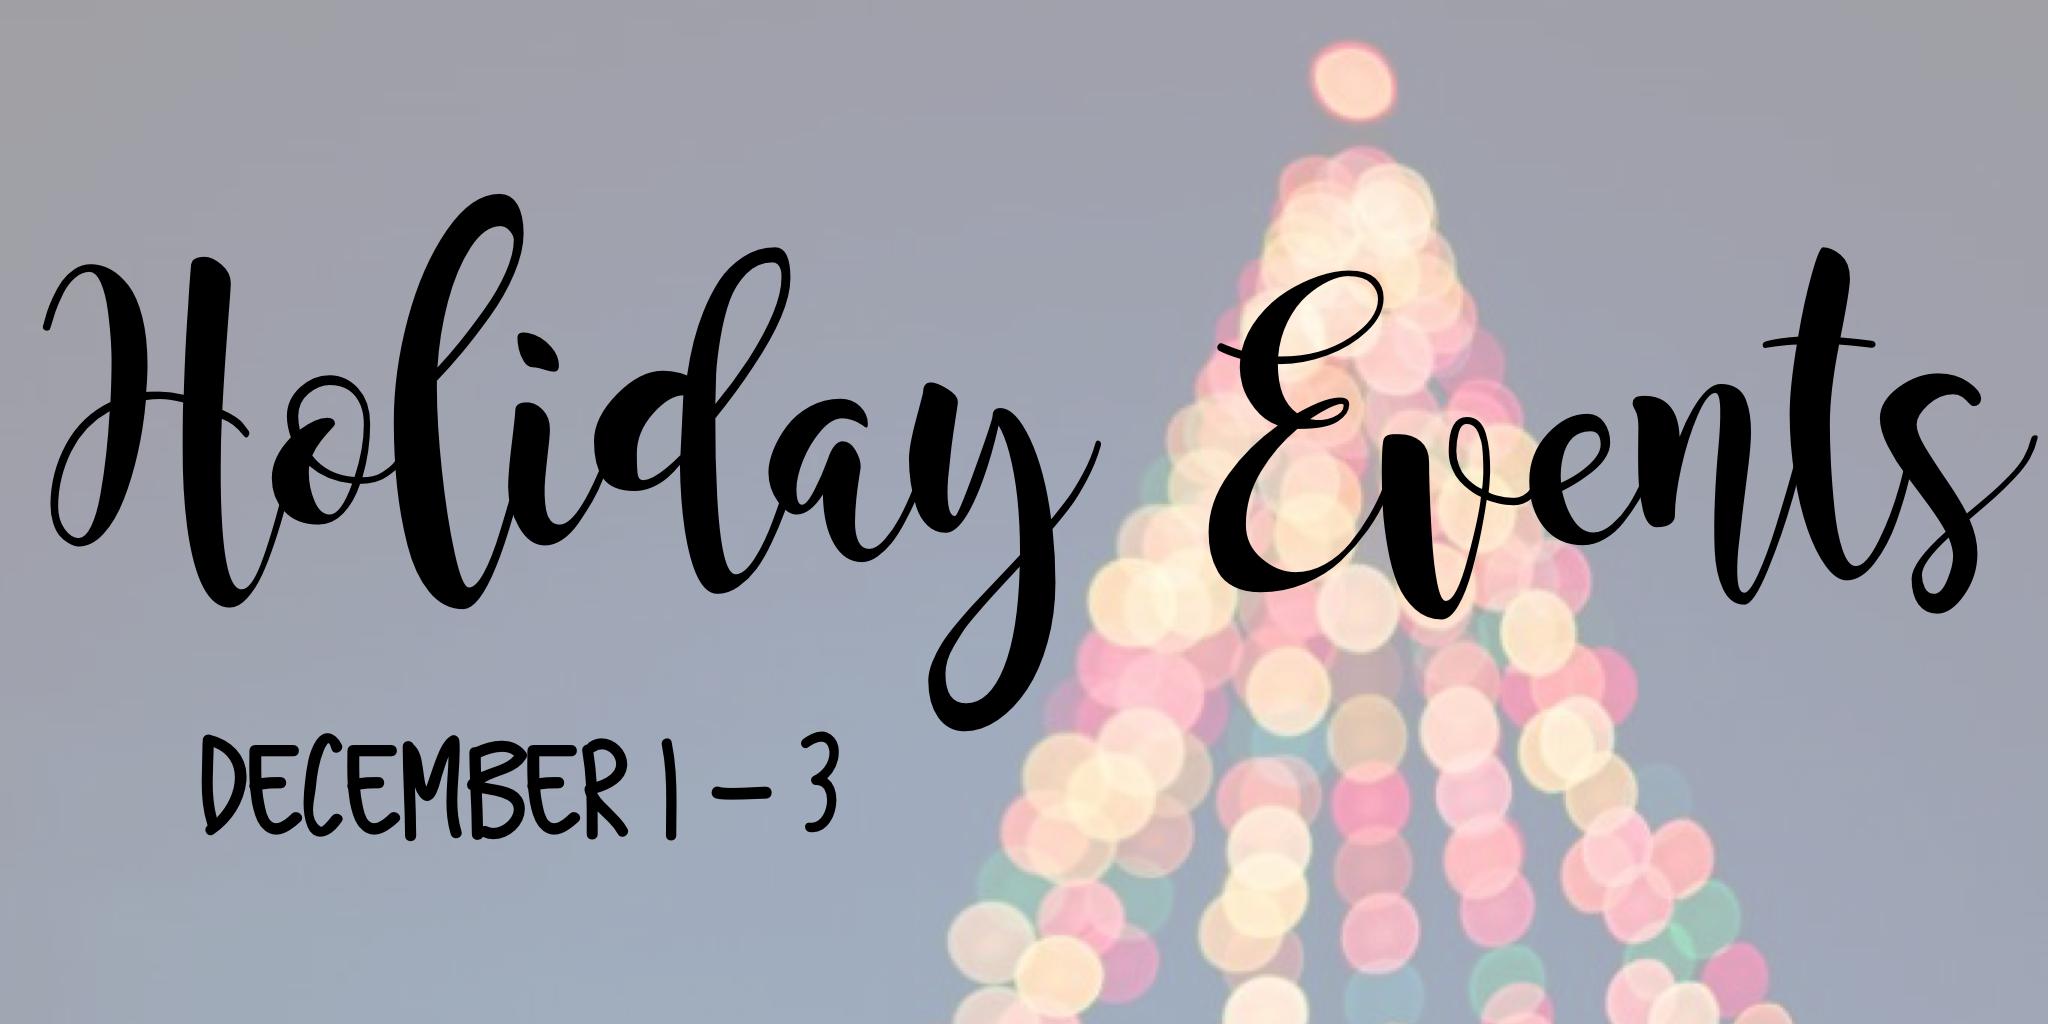 Holiday Events – December 1 – December 3